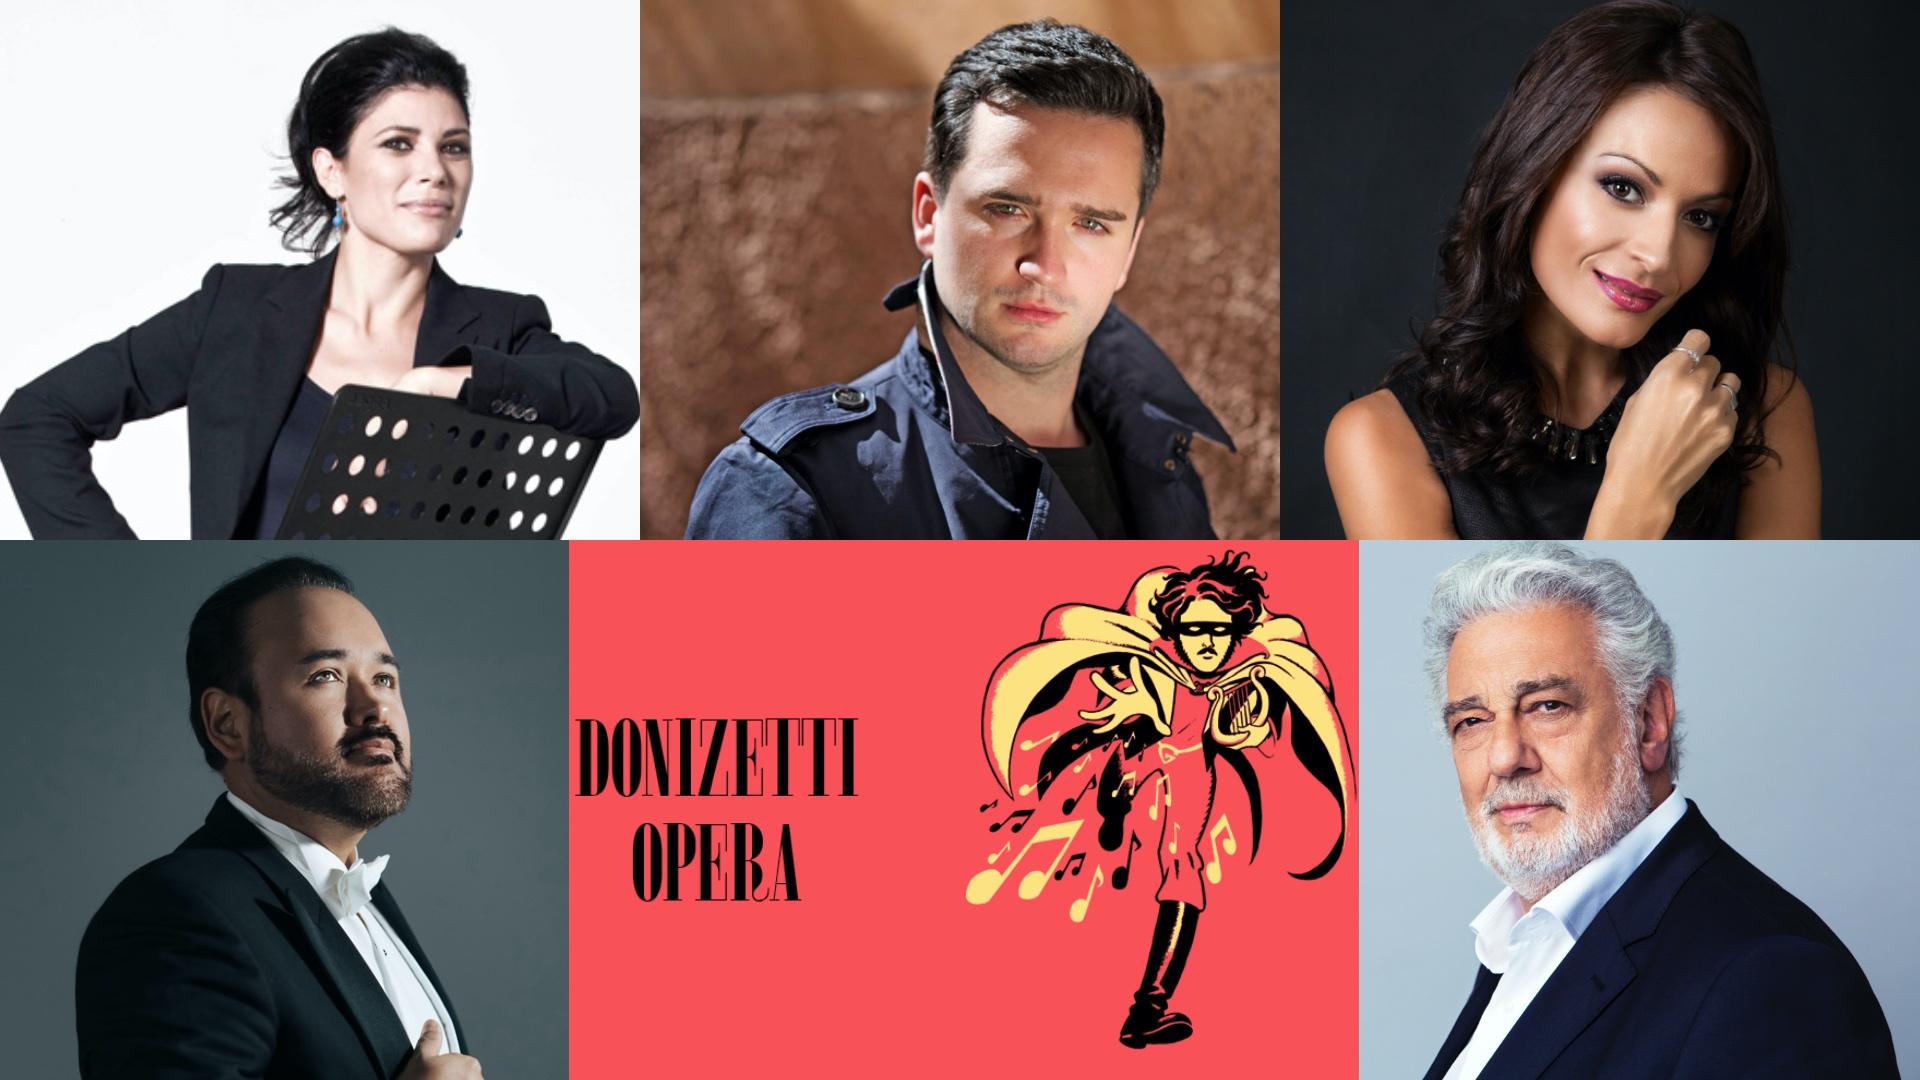 Donizetti Opera 2020 | Bergamo